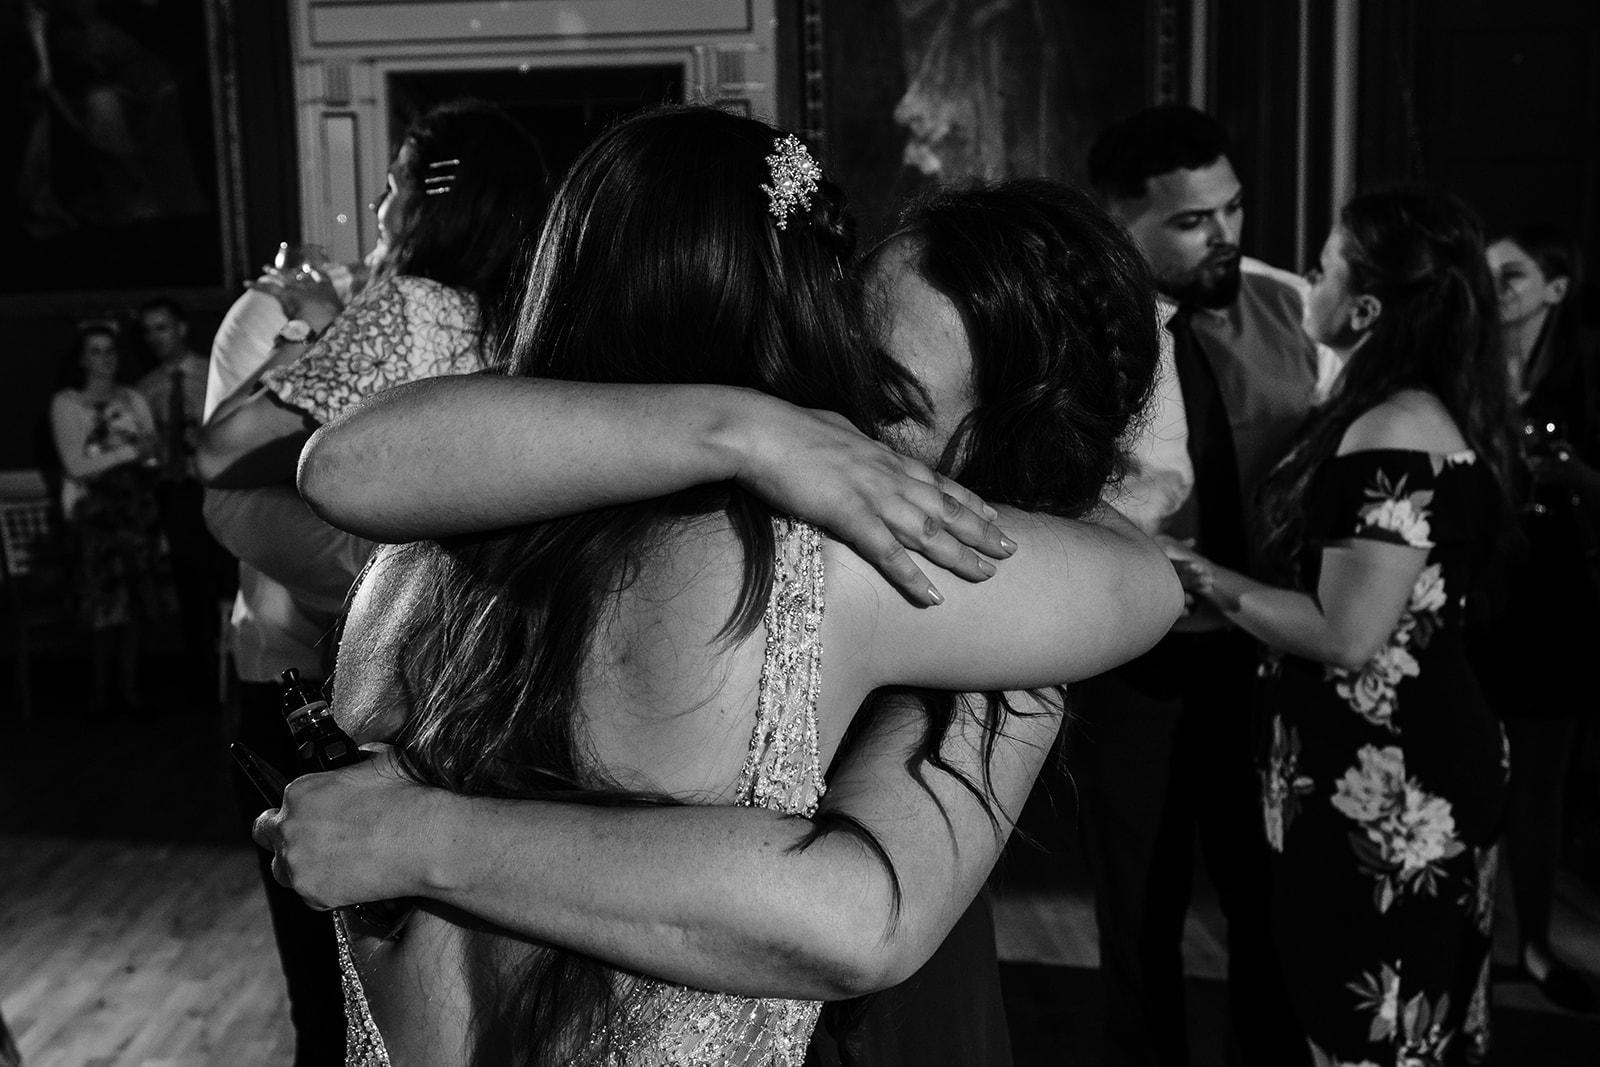 Yasmin hugs her friend on the dance floor